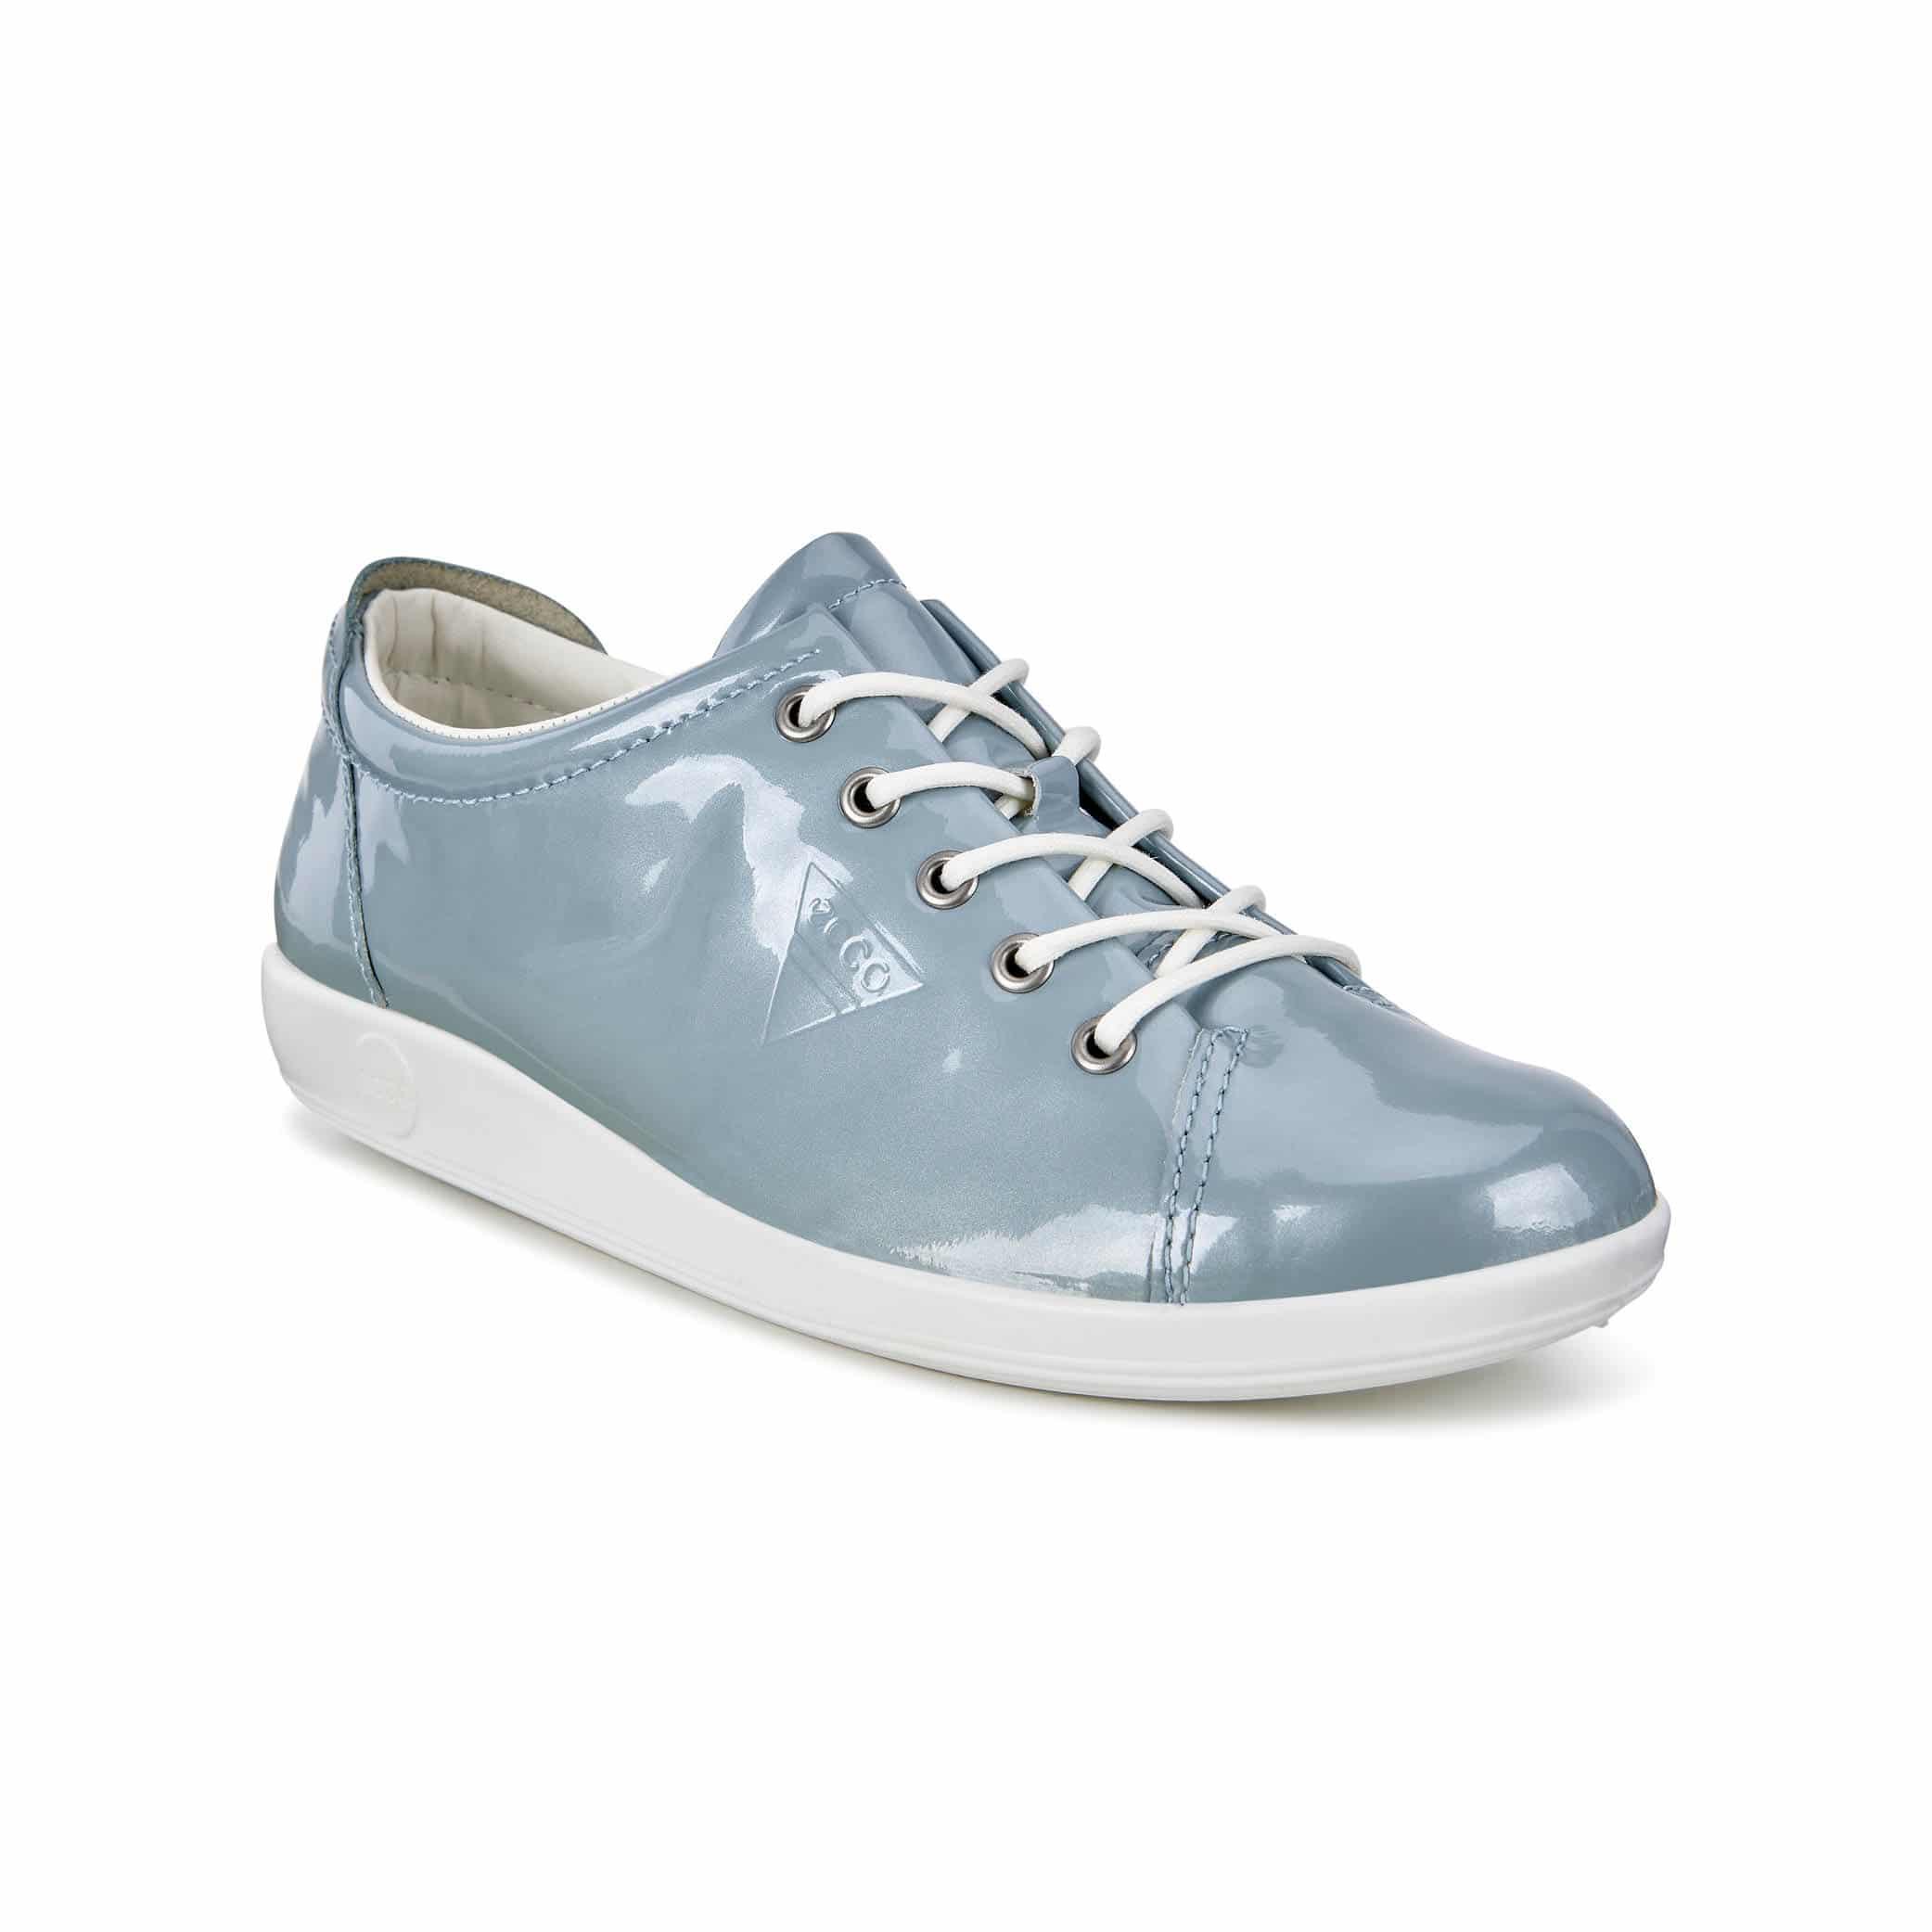 75bd5e068c46d ECCO SOFT 2.0 - ECCO Shoes for Men, Women & Kids